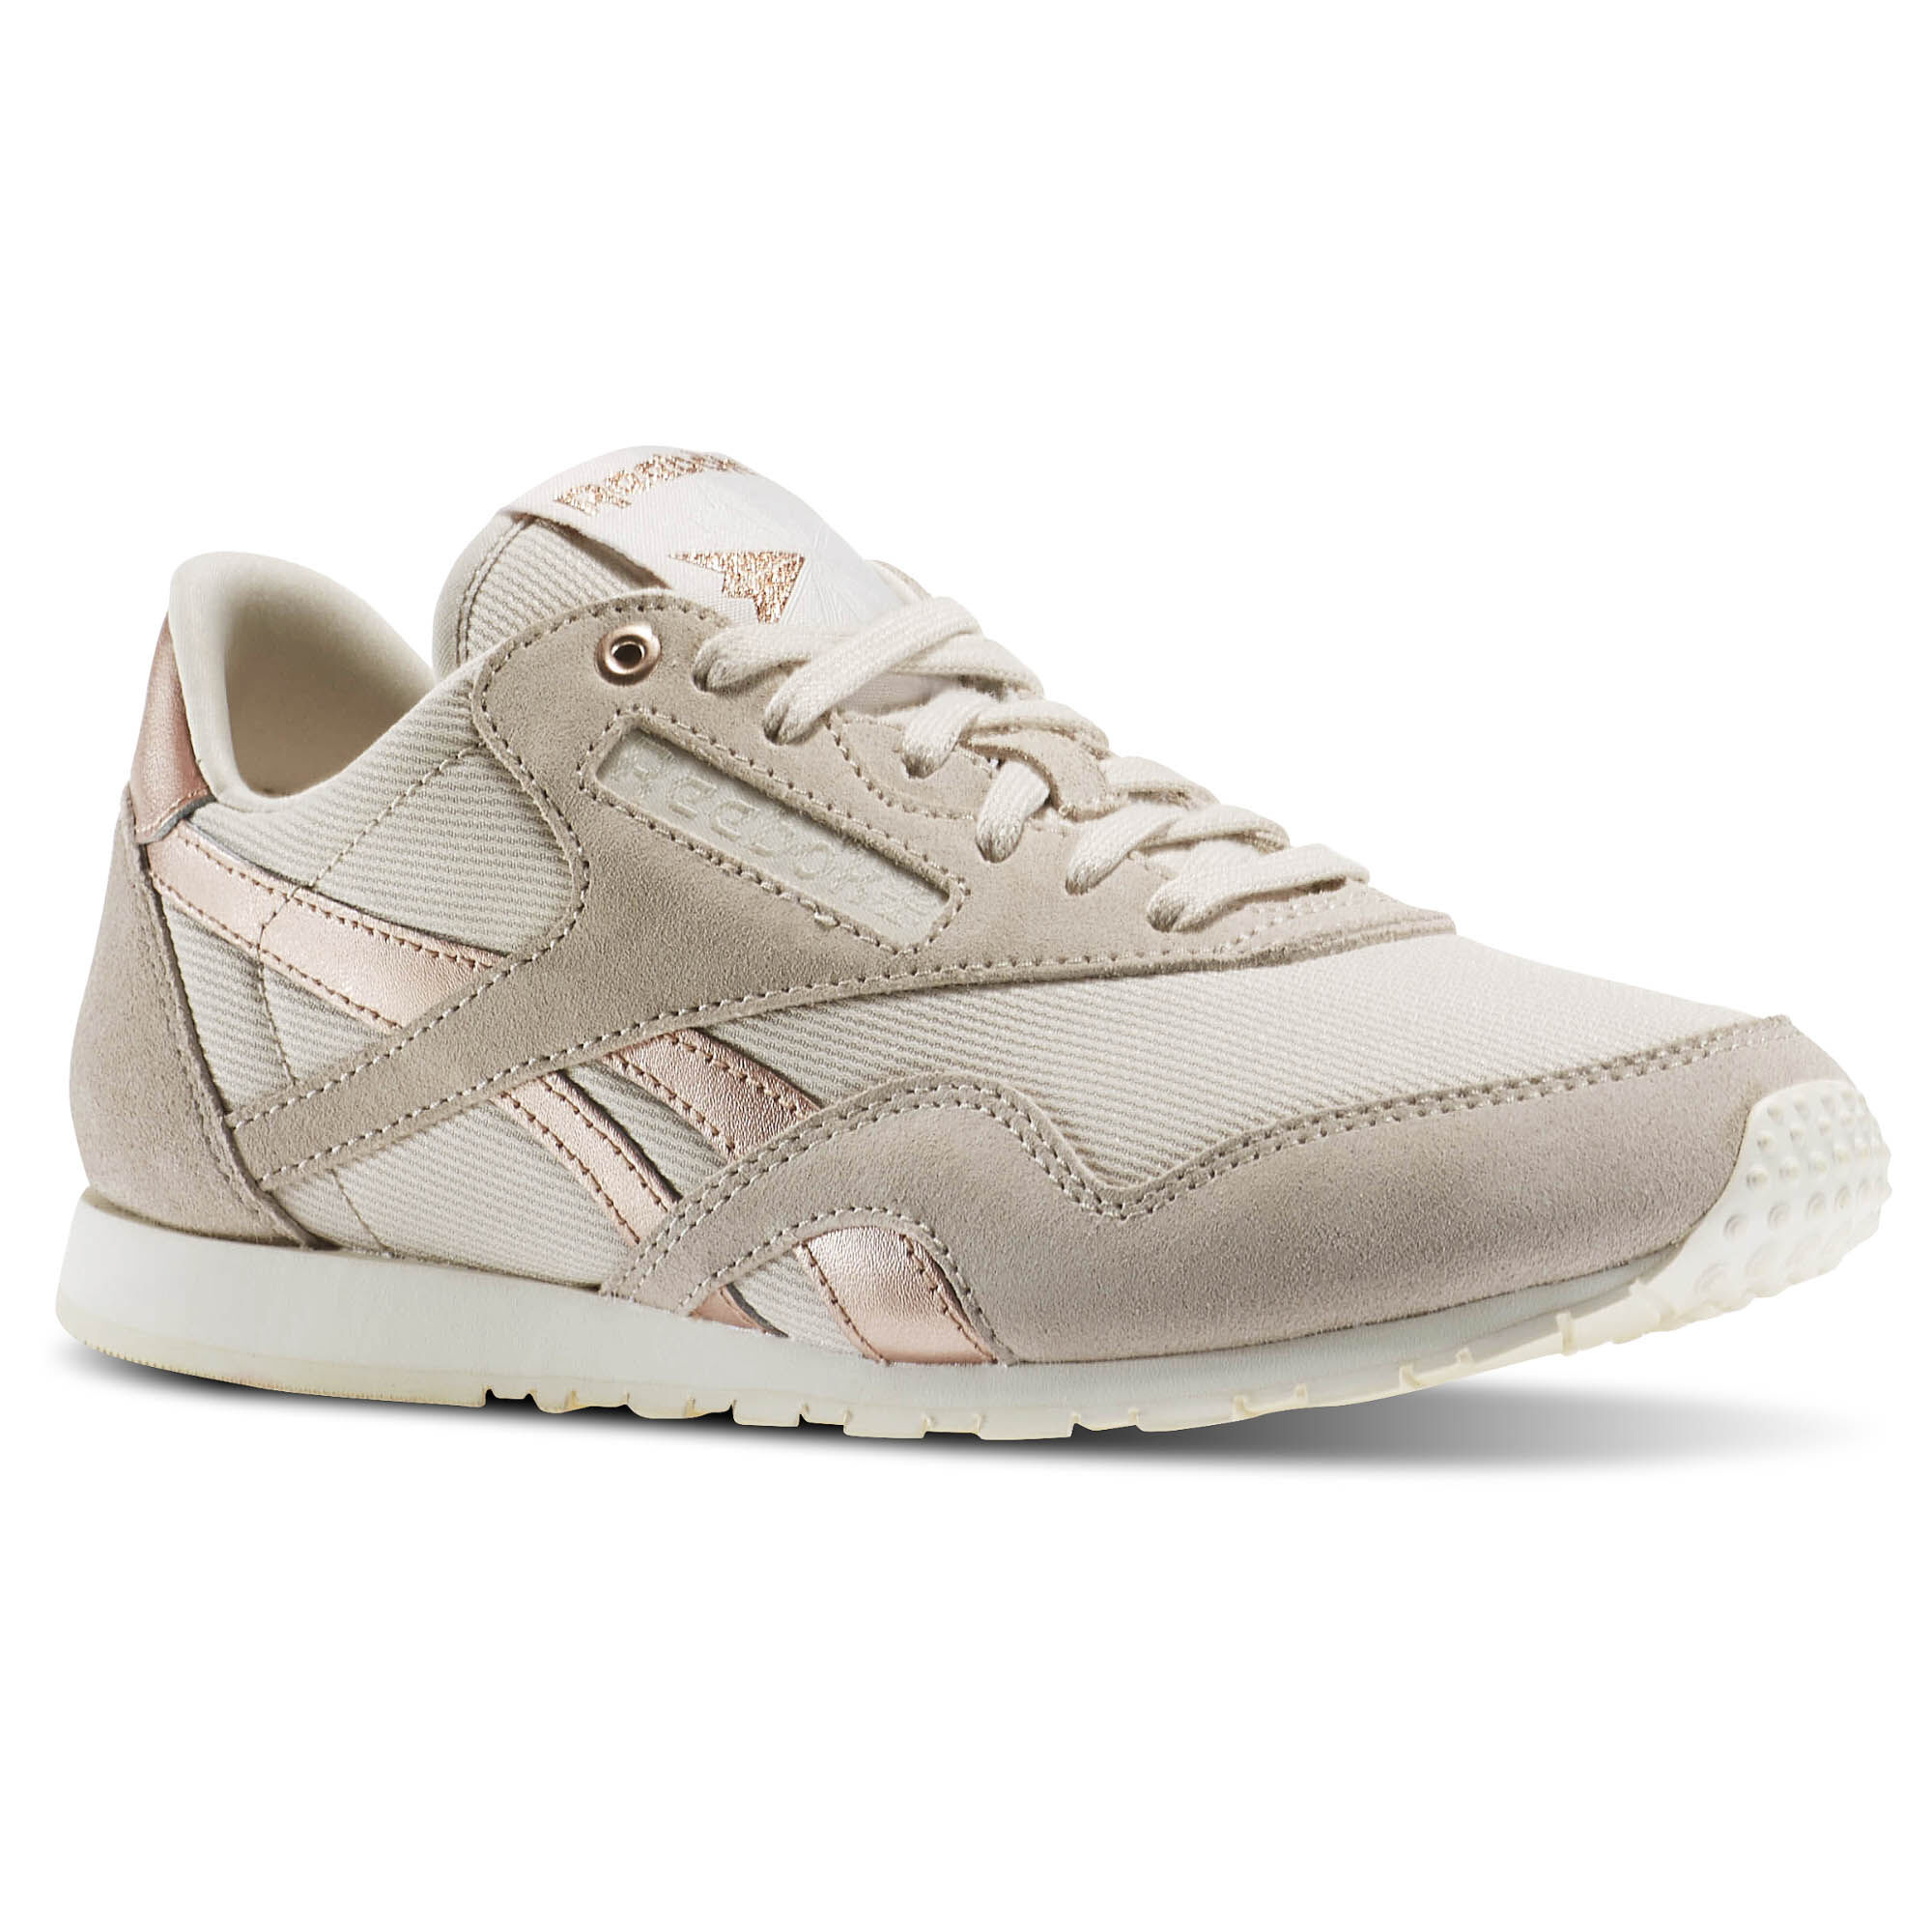 Reebok Classic Nylon Womens Shoes